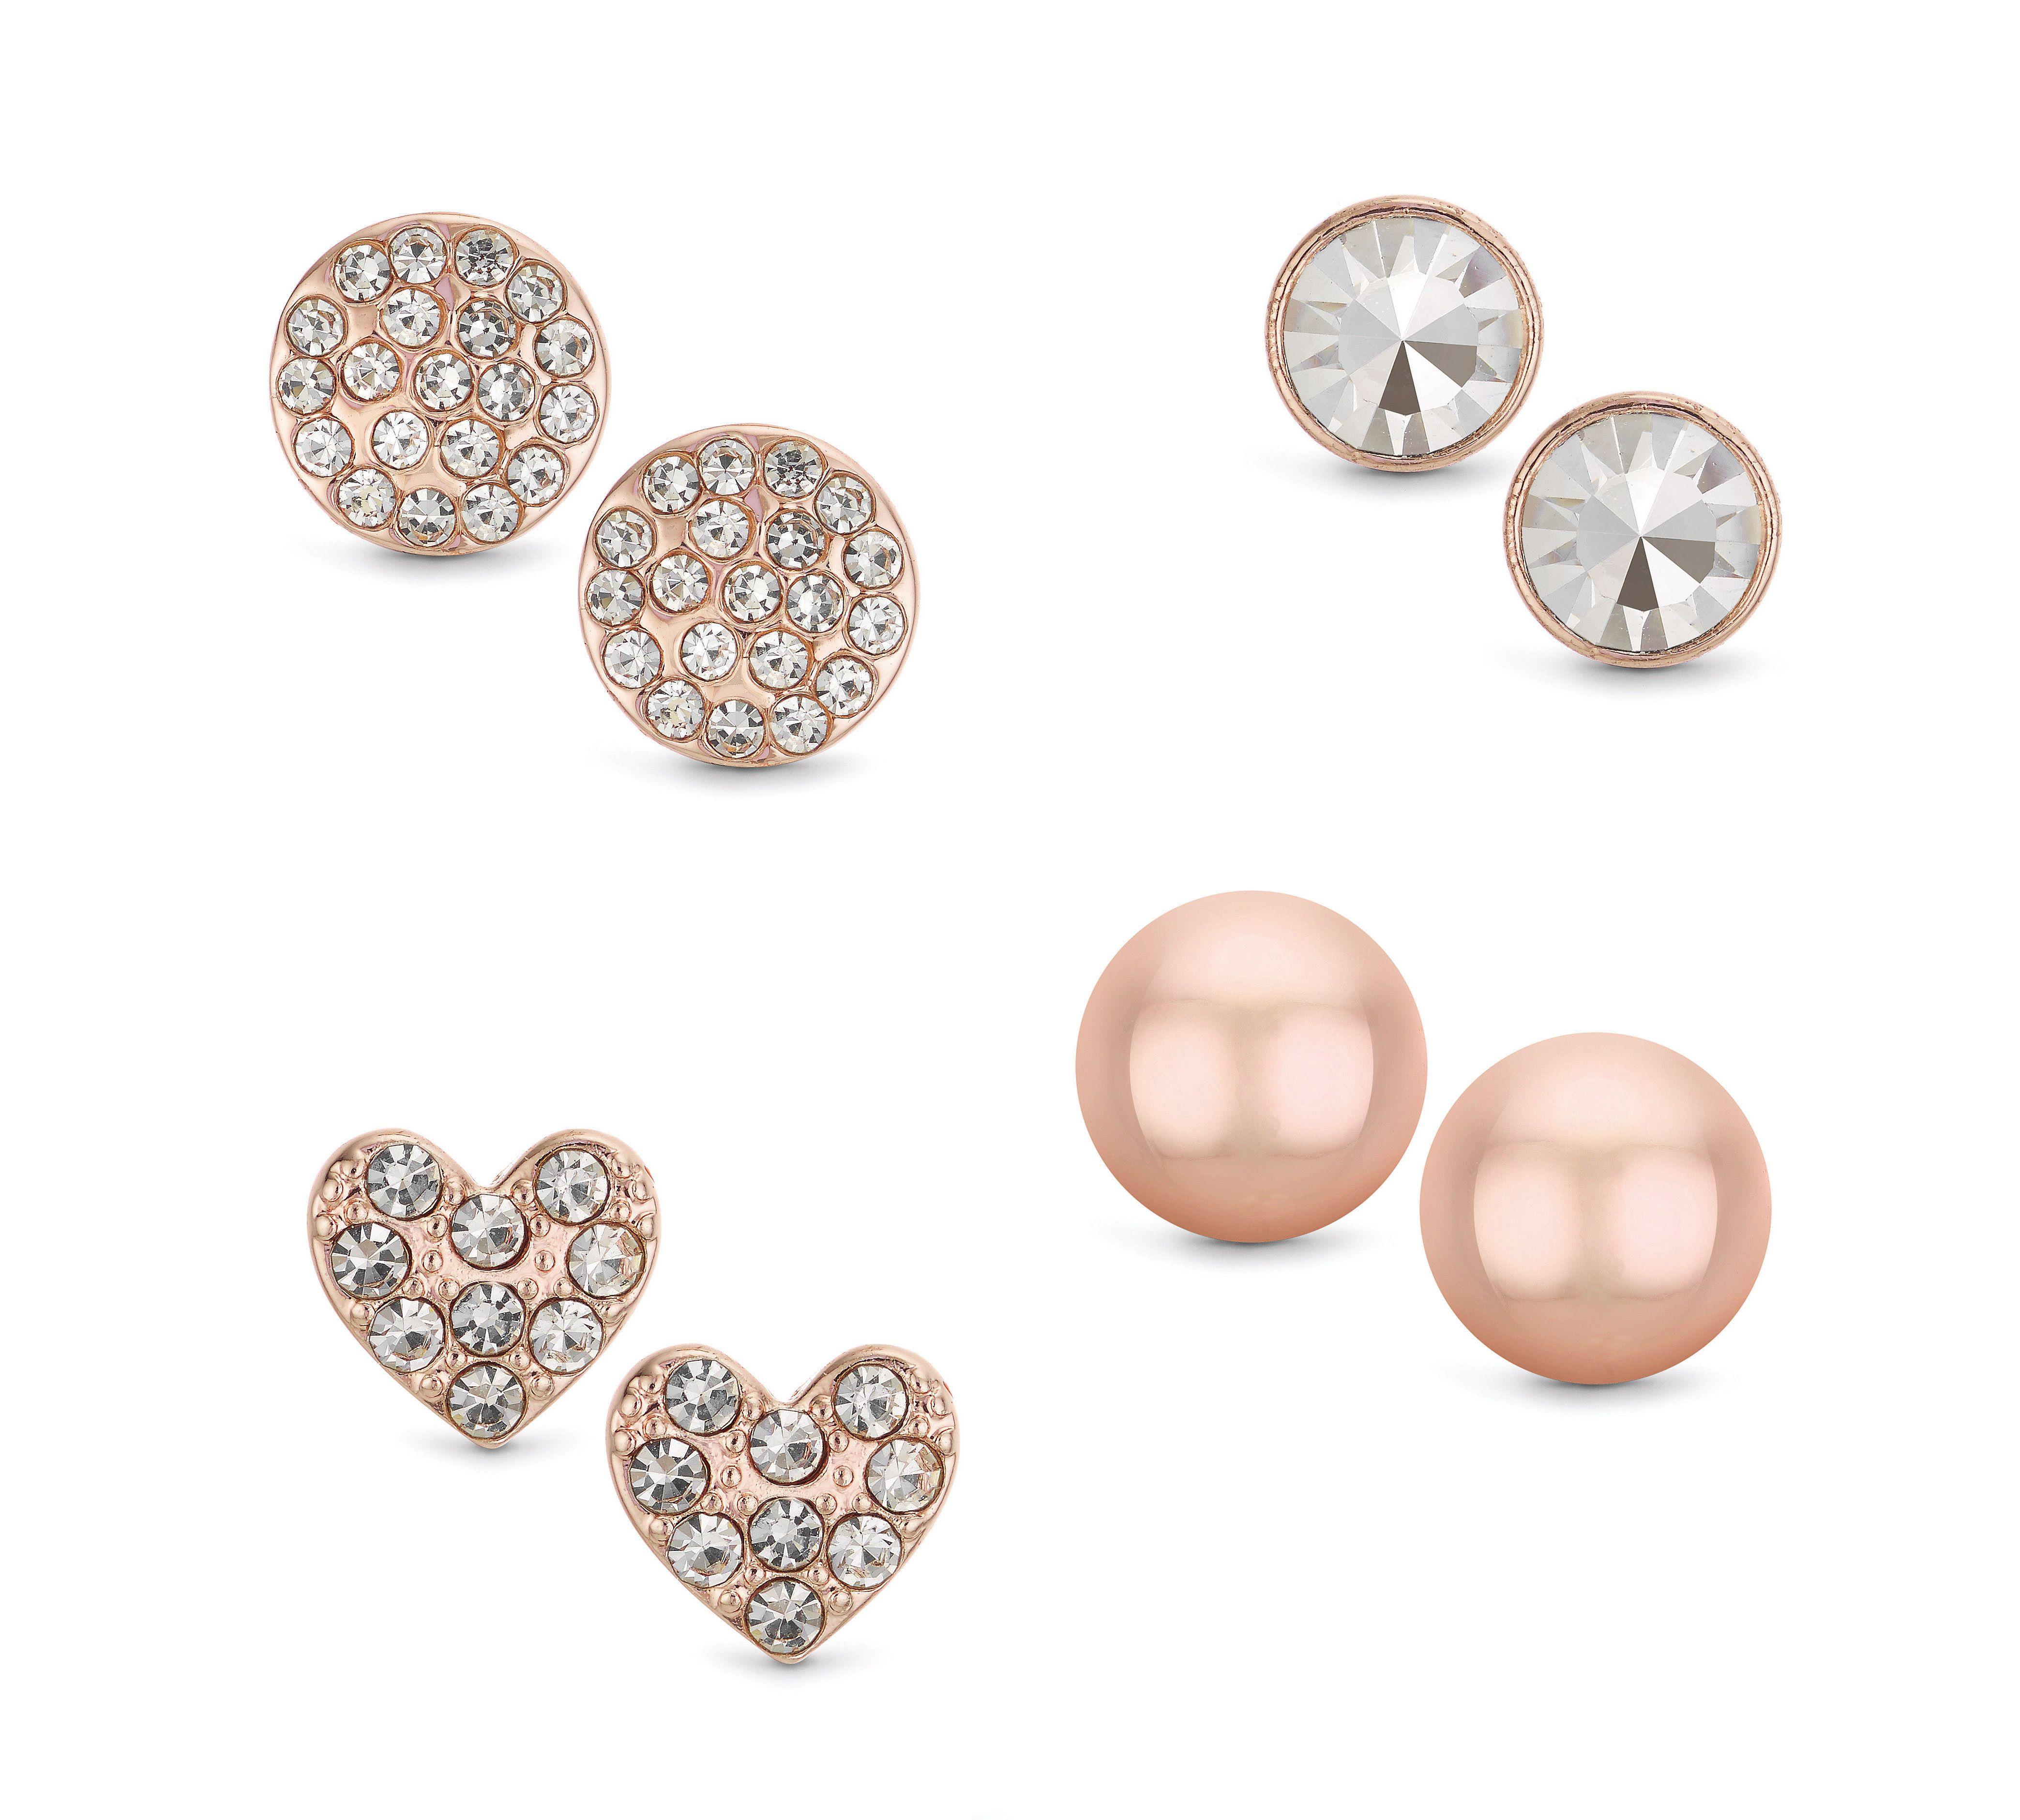 Buckley London Four Piece Rose Gold Stud Earrings Set